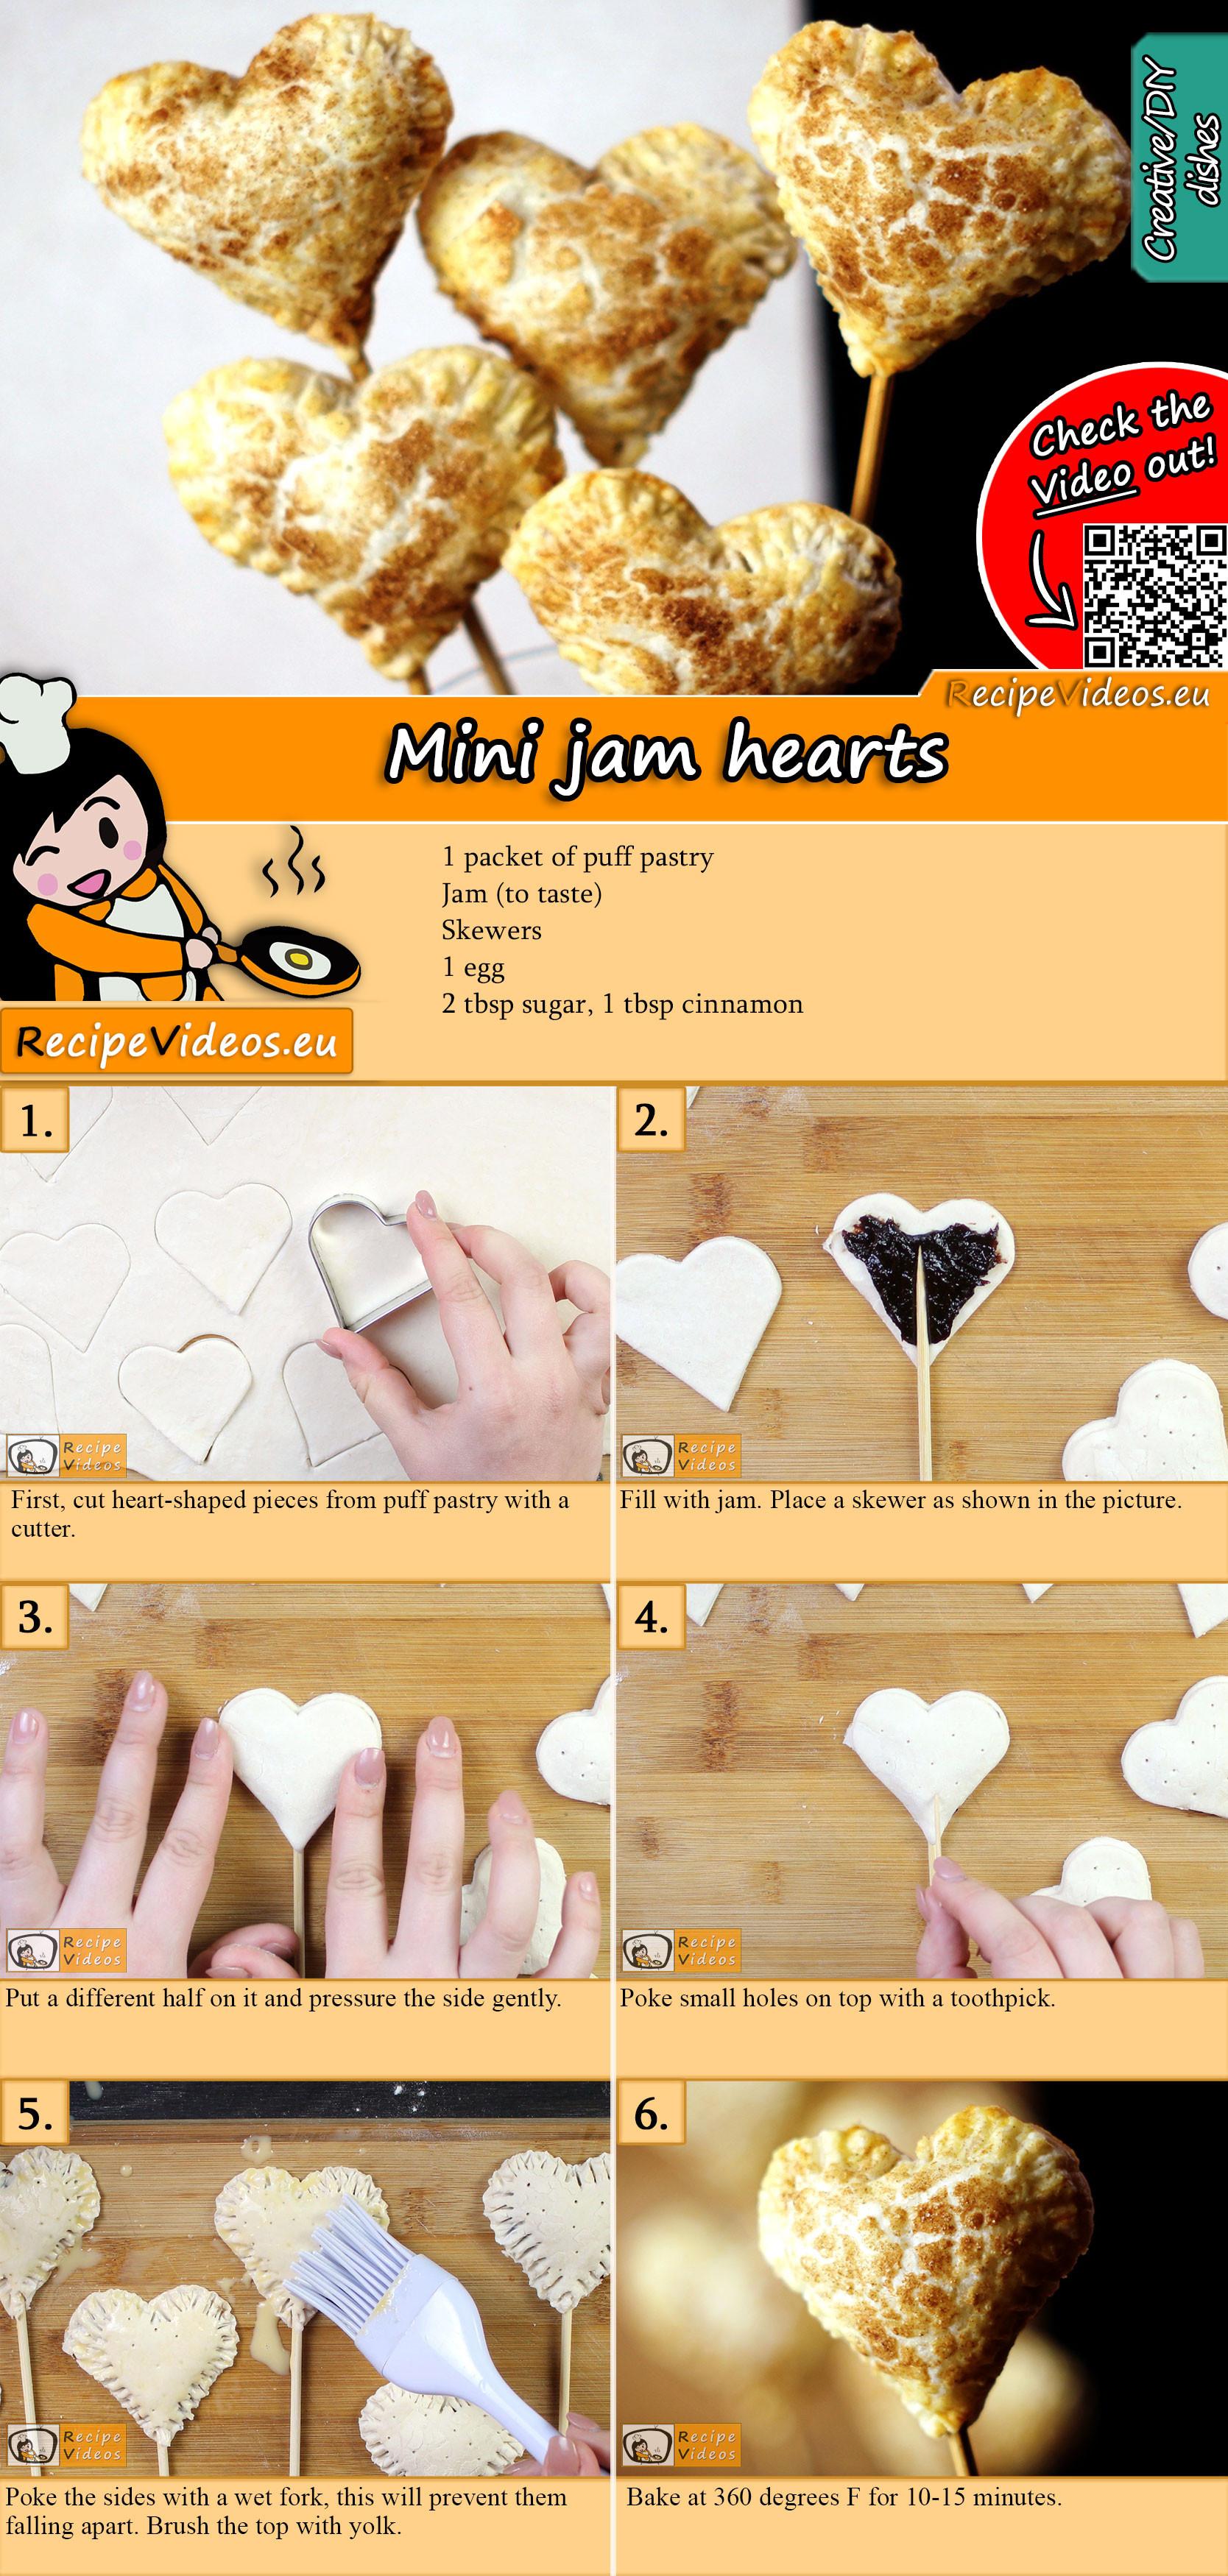 Mini jam hearts recipe with video